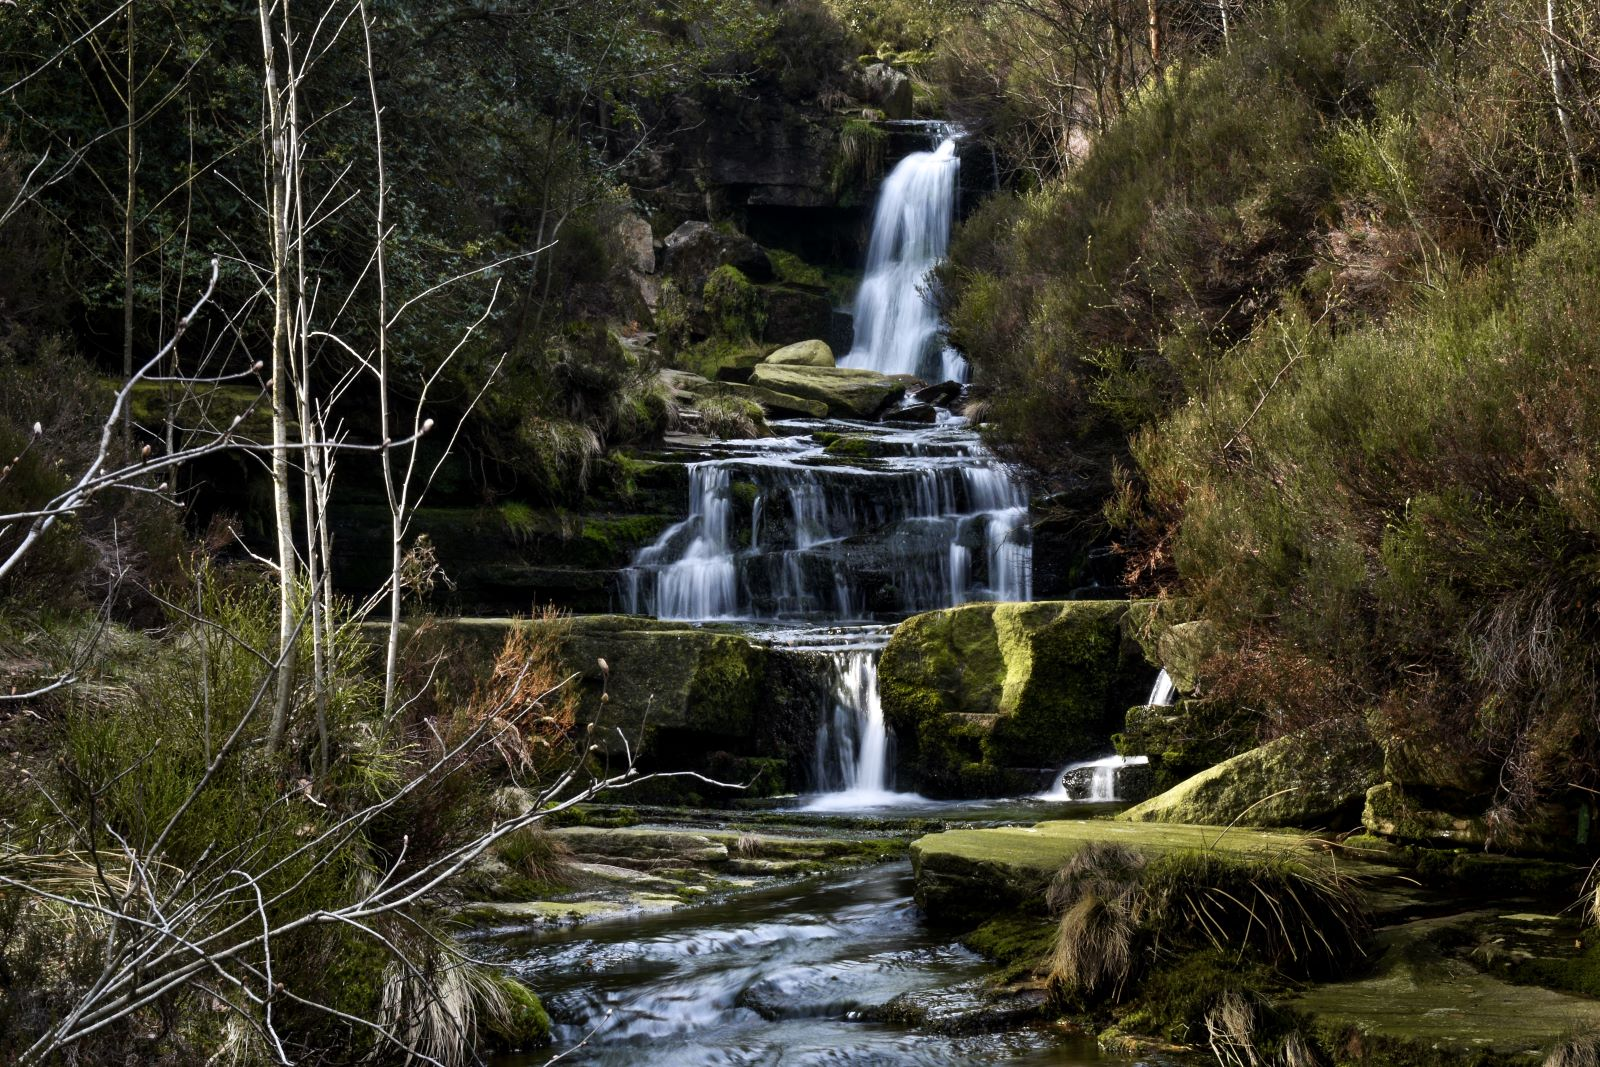 Black Clough Waterfall